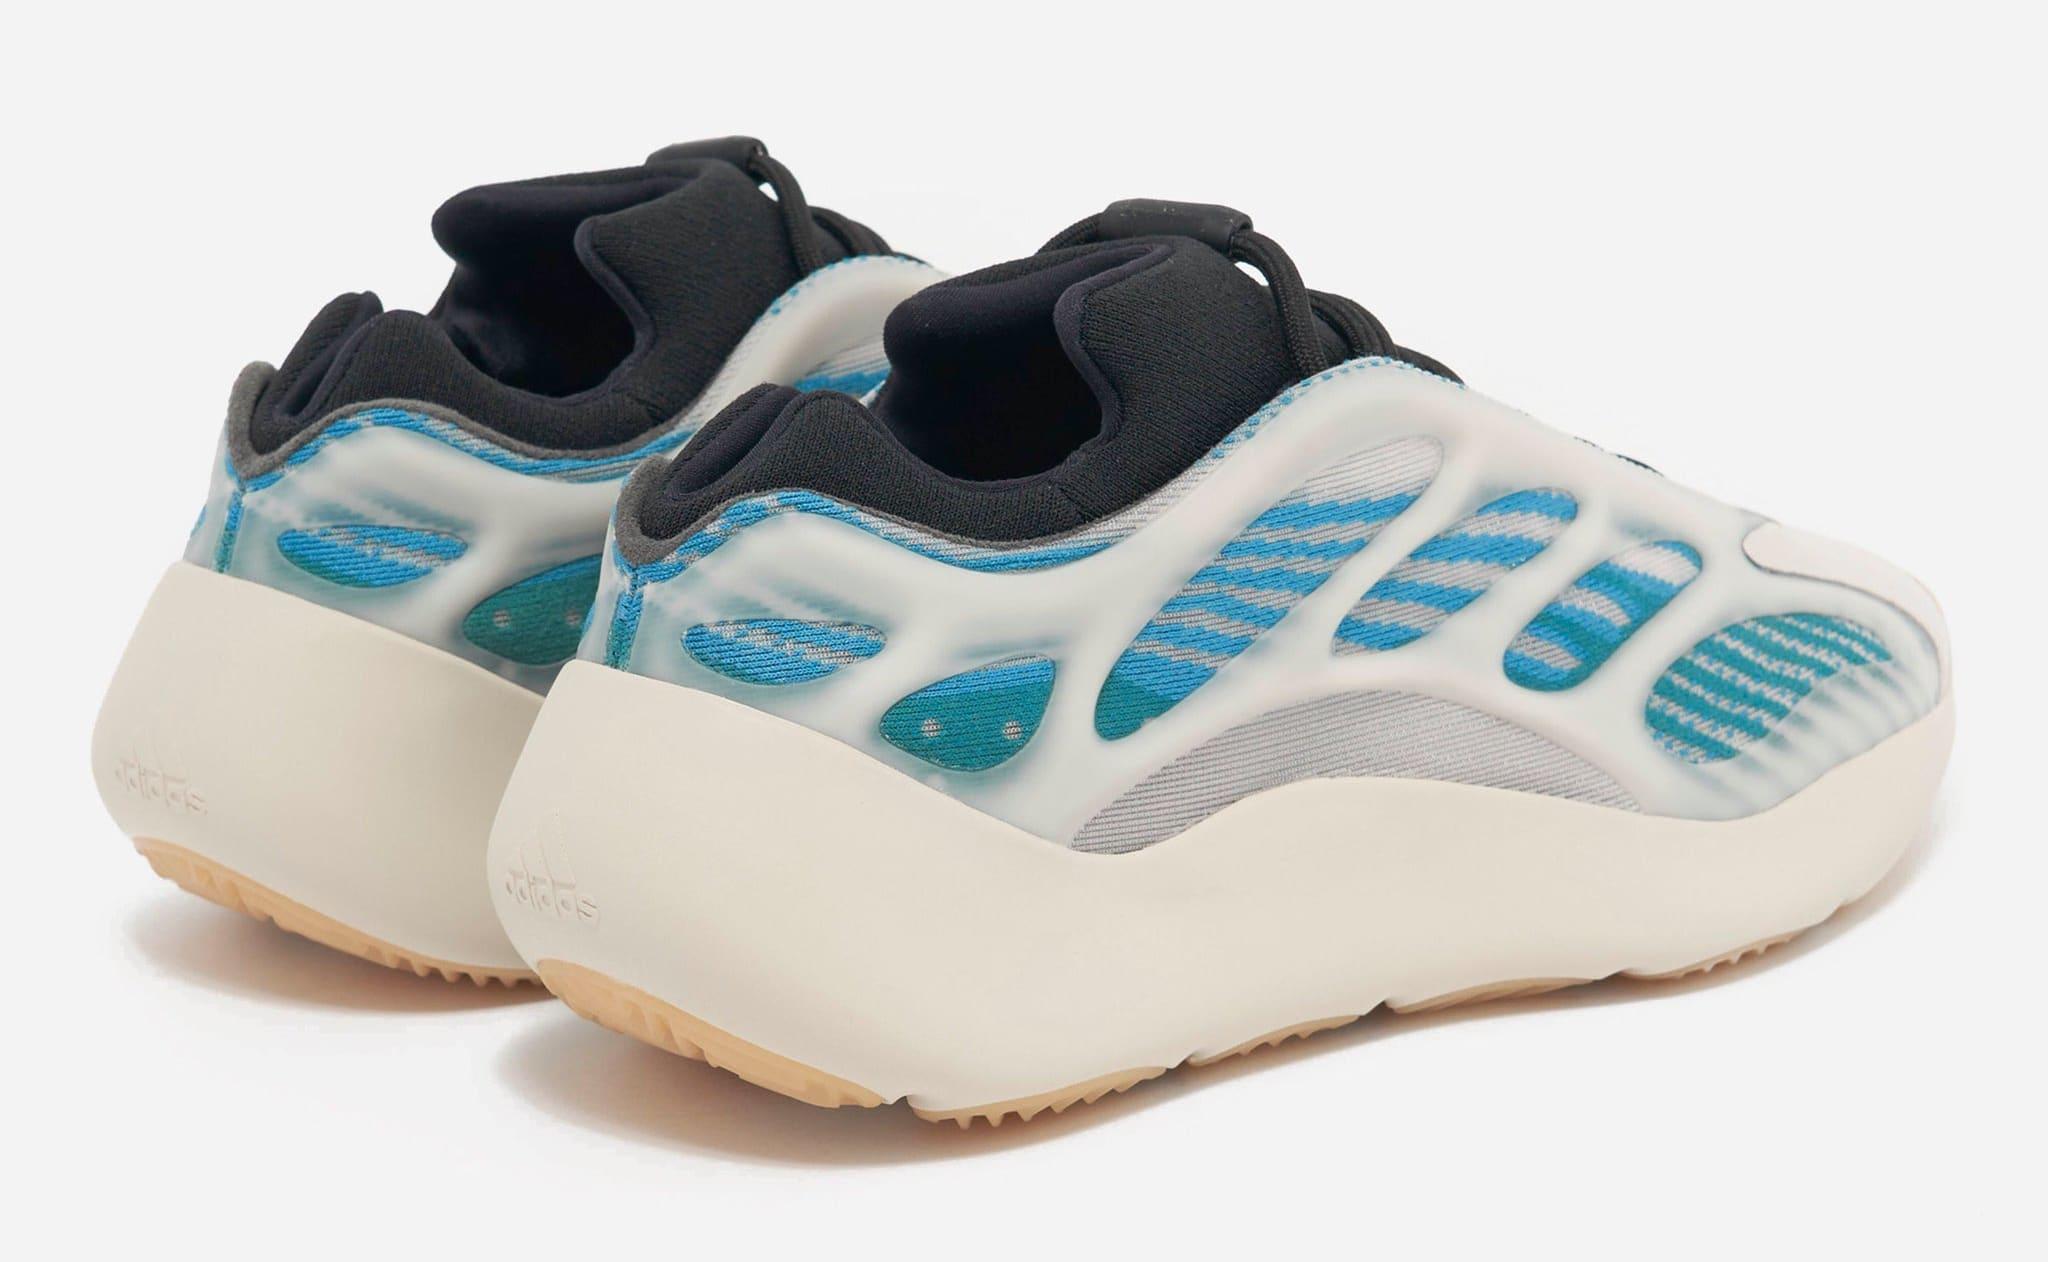 Adidas Yeezy 700 V3 'Kyanite' Heel